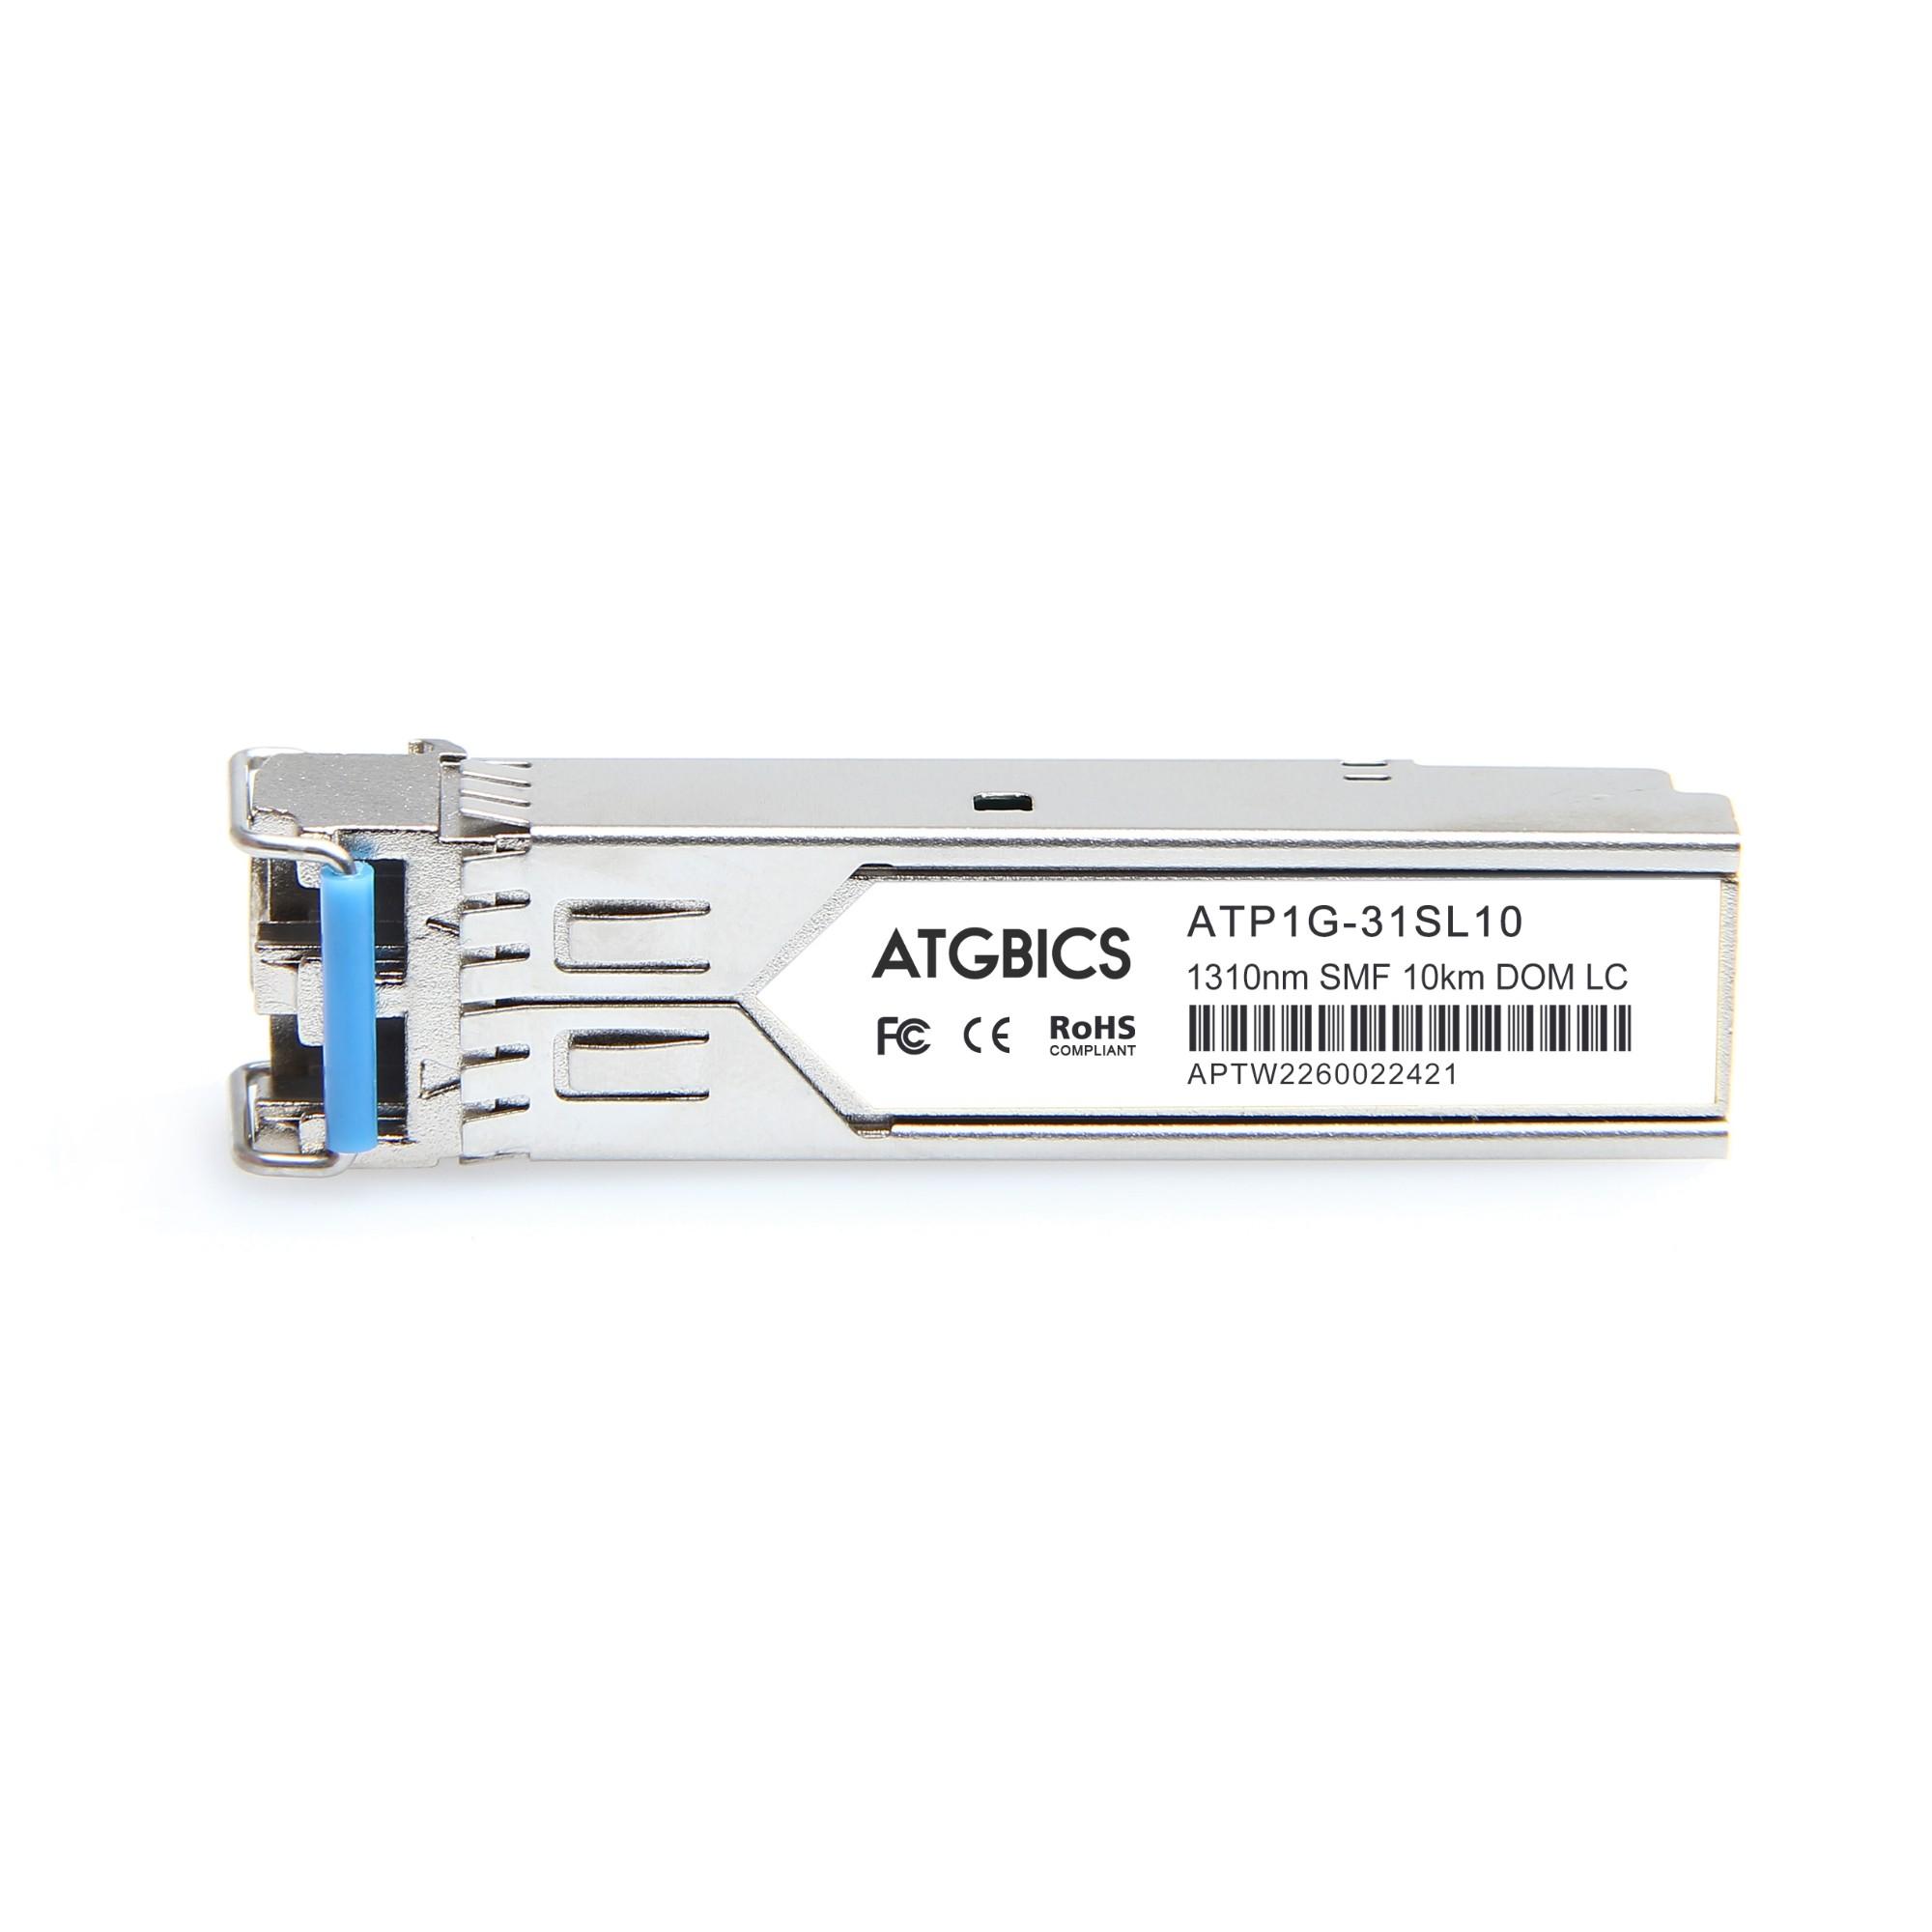 Image of ATGBICS FC9686MSIR-C network transceiver module Fiber optic 1000 Mbit/s SFP 1310 nm